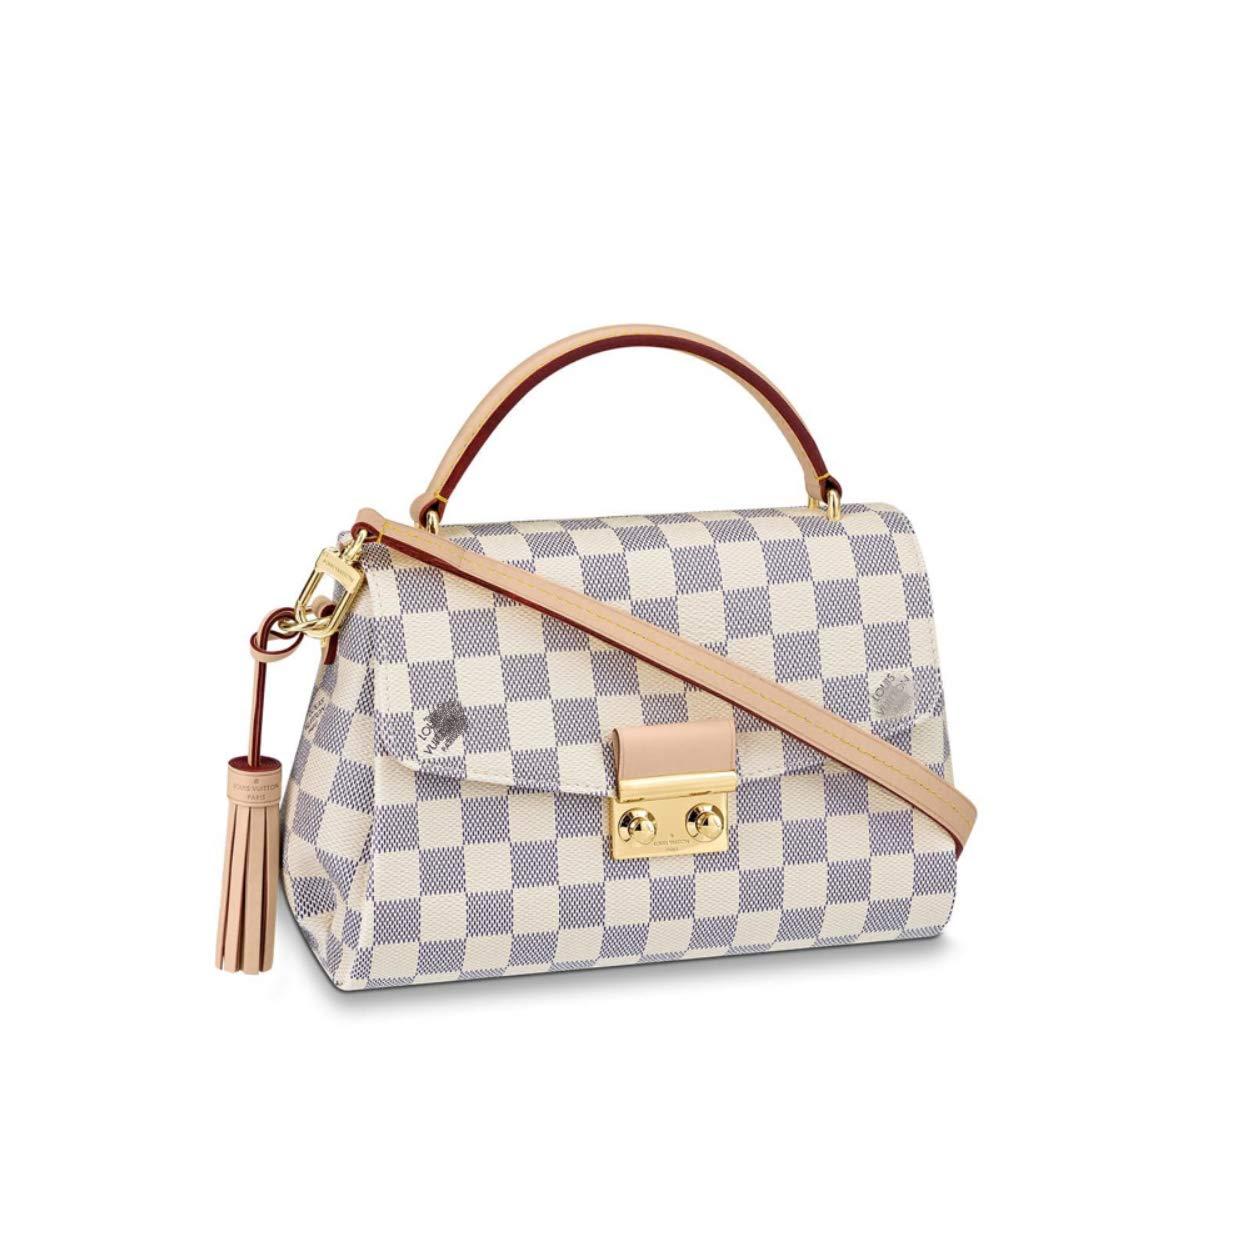 HPASS Classic CROISETTE Style Designer Woman Tassel Handbag Damier Tote Shoulder Bag(25x17x9.5cm)